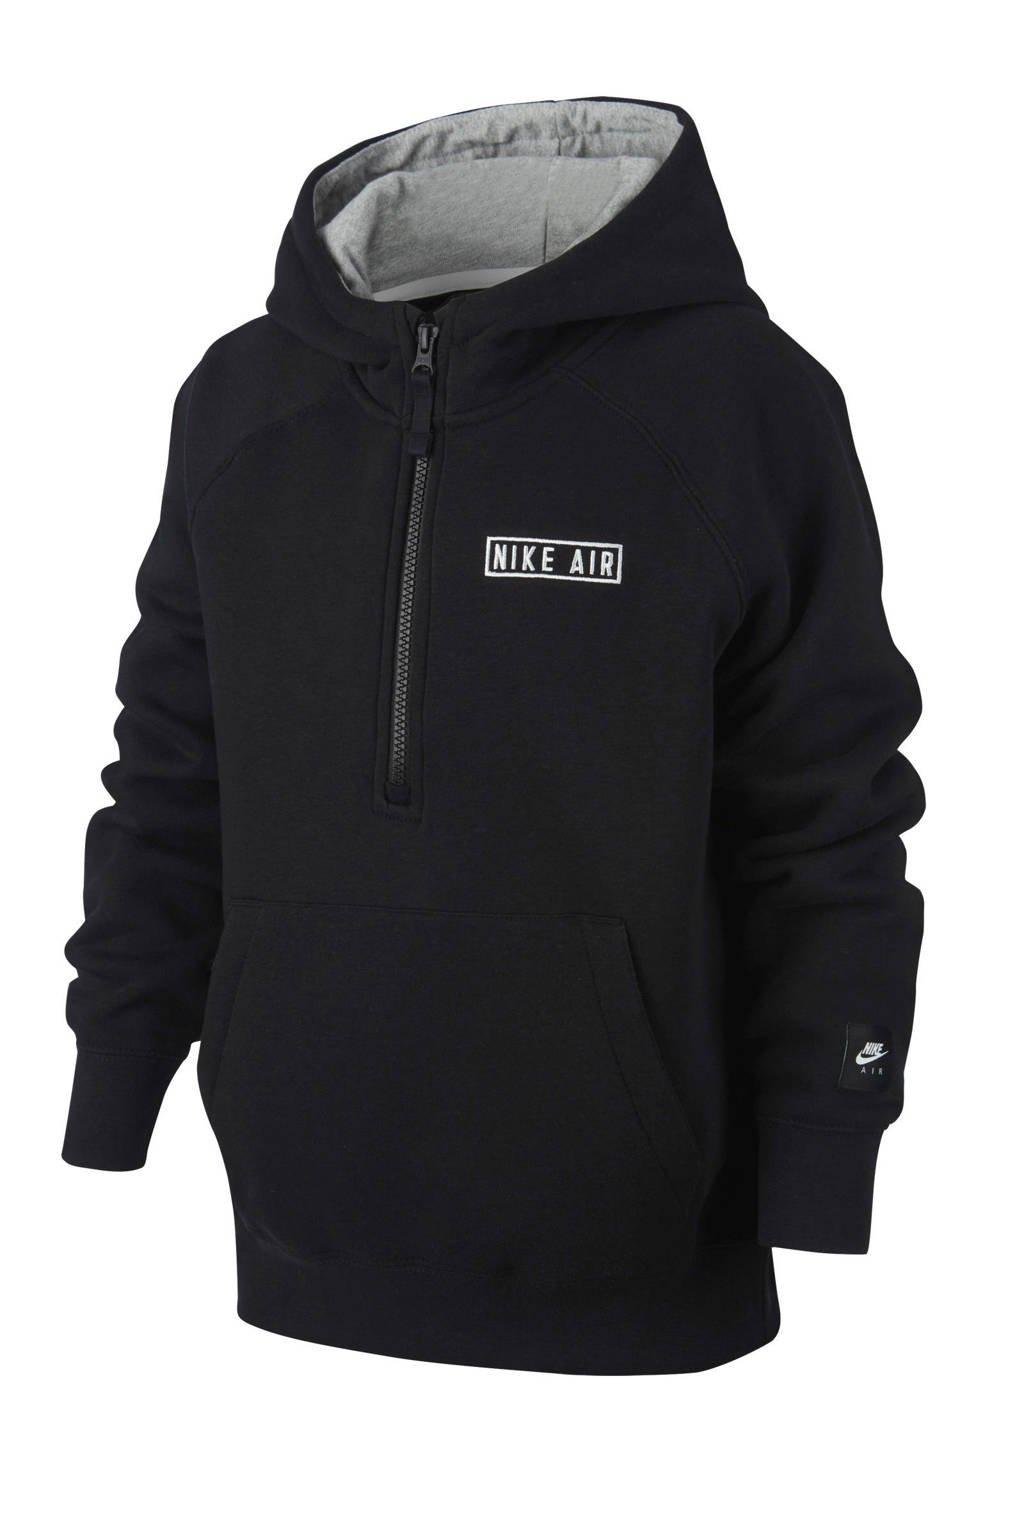 Nike   Air hoodie zwart, Zwart